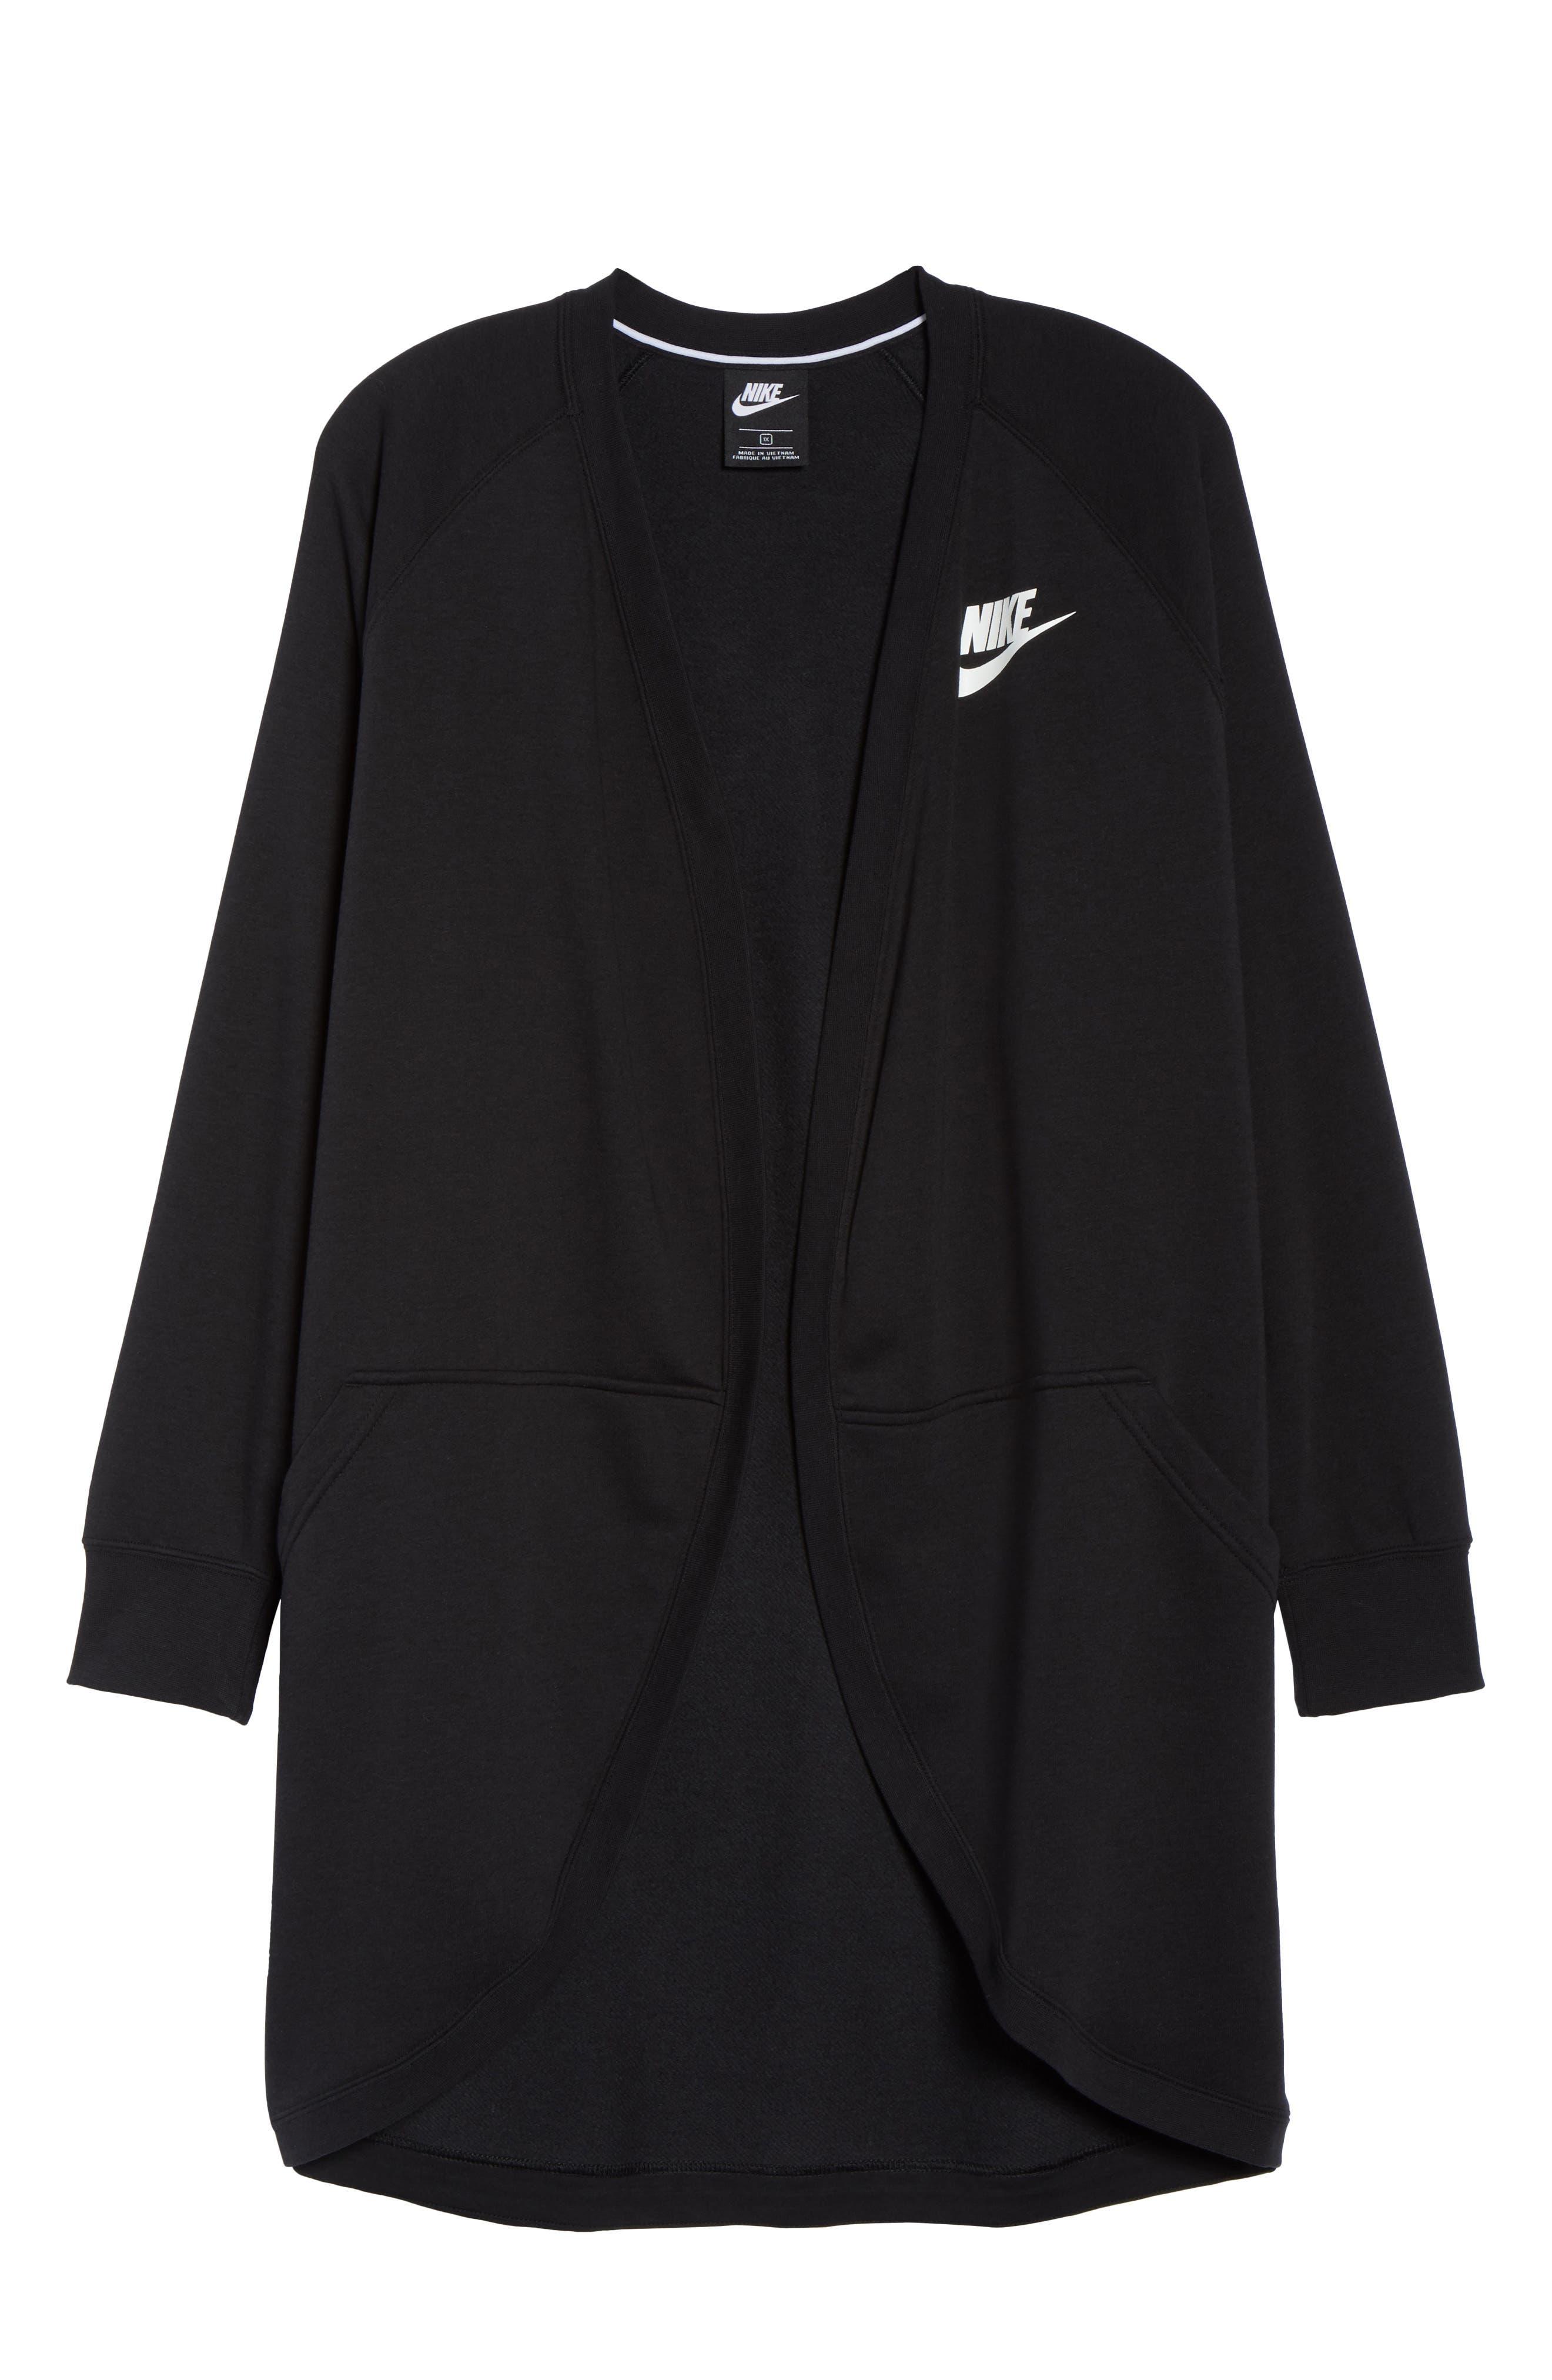 Sportswear Rally Cardigan,                             Alternate thumbnail 7, color,                             BLACK/ BLACK/ WHITE